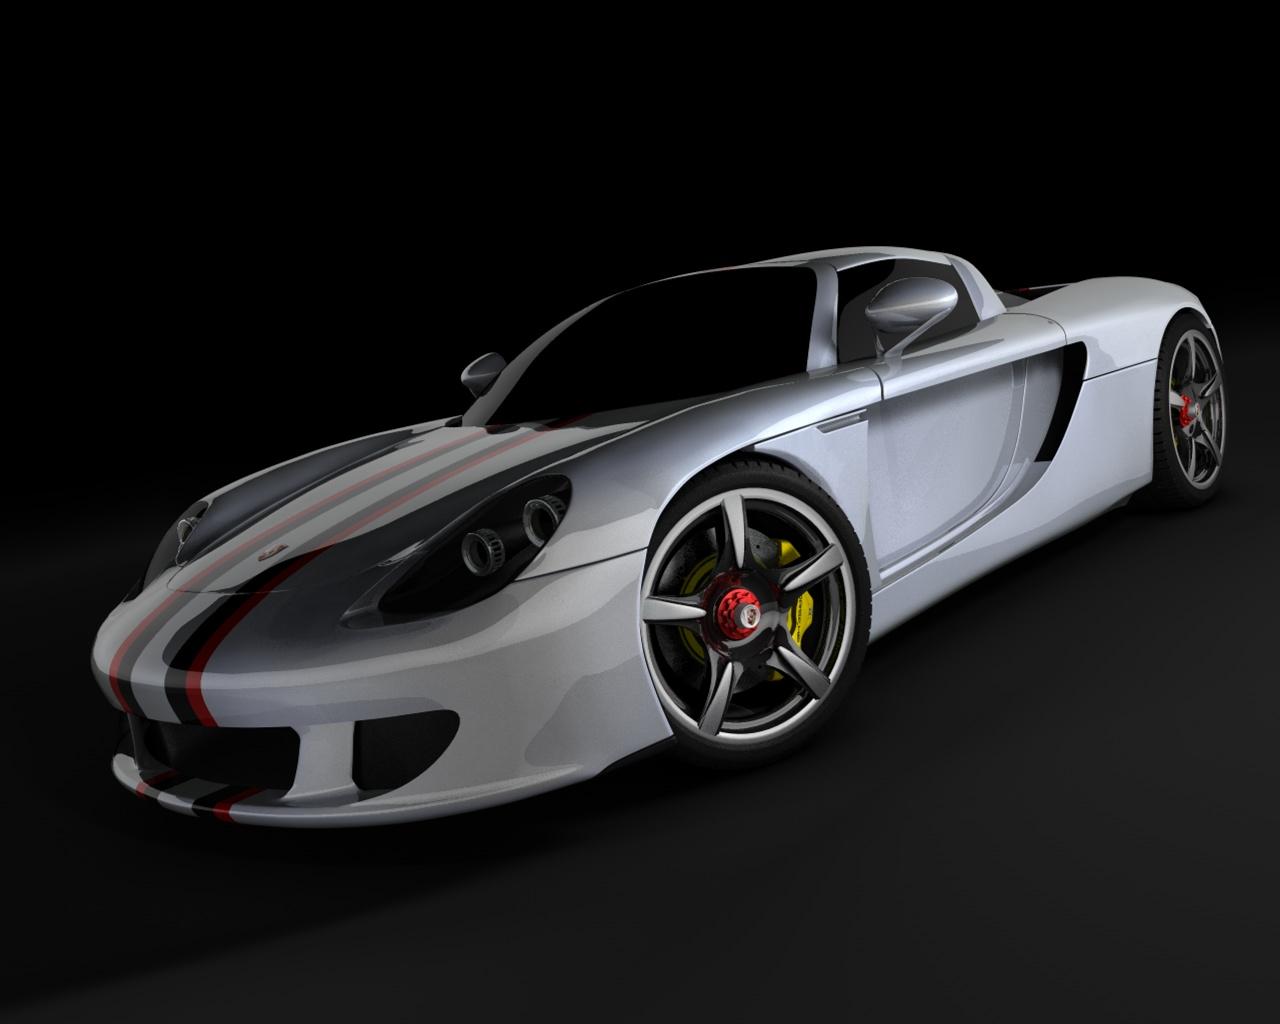 Porsche Carrera GT - Final2 by Yakul